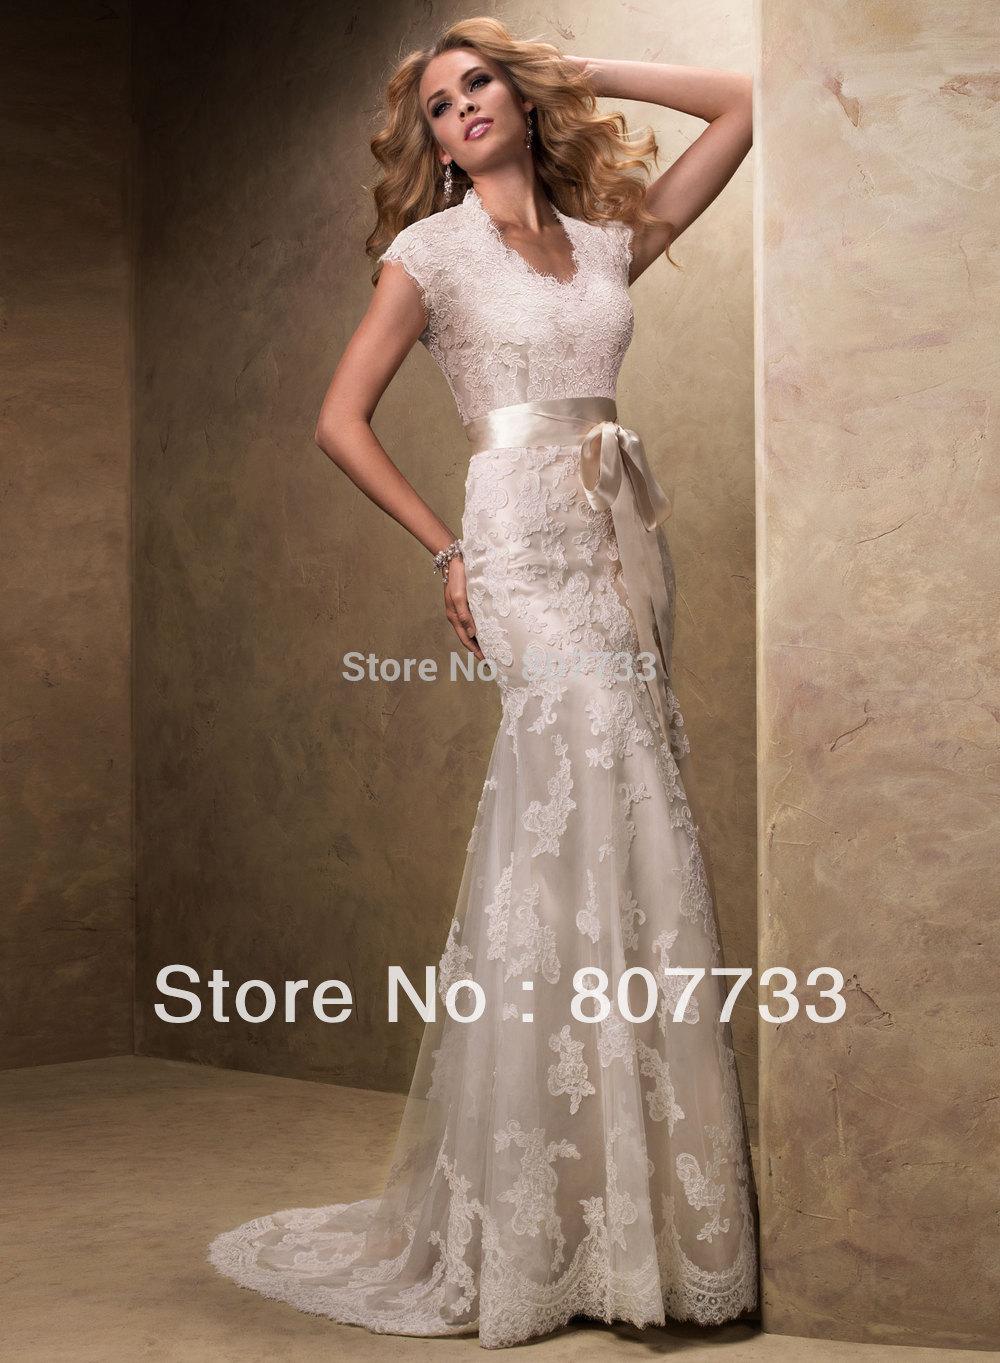 6 types of sexy wedding dresses sexy wedding dresses images Sexy elegant jewel lace wedding dress